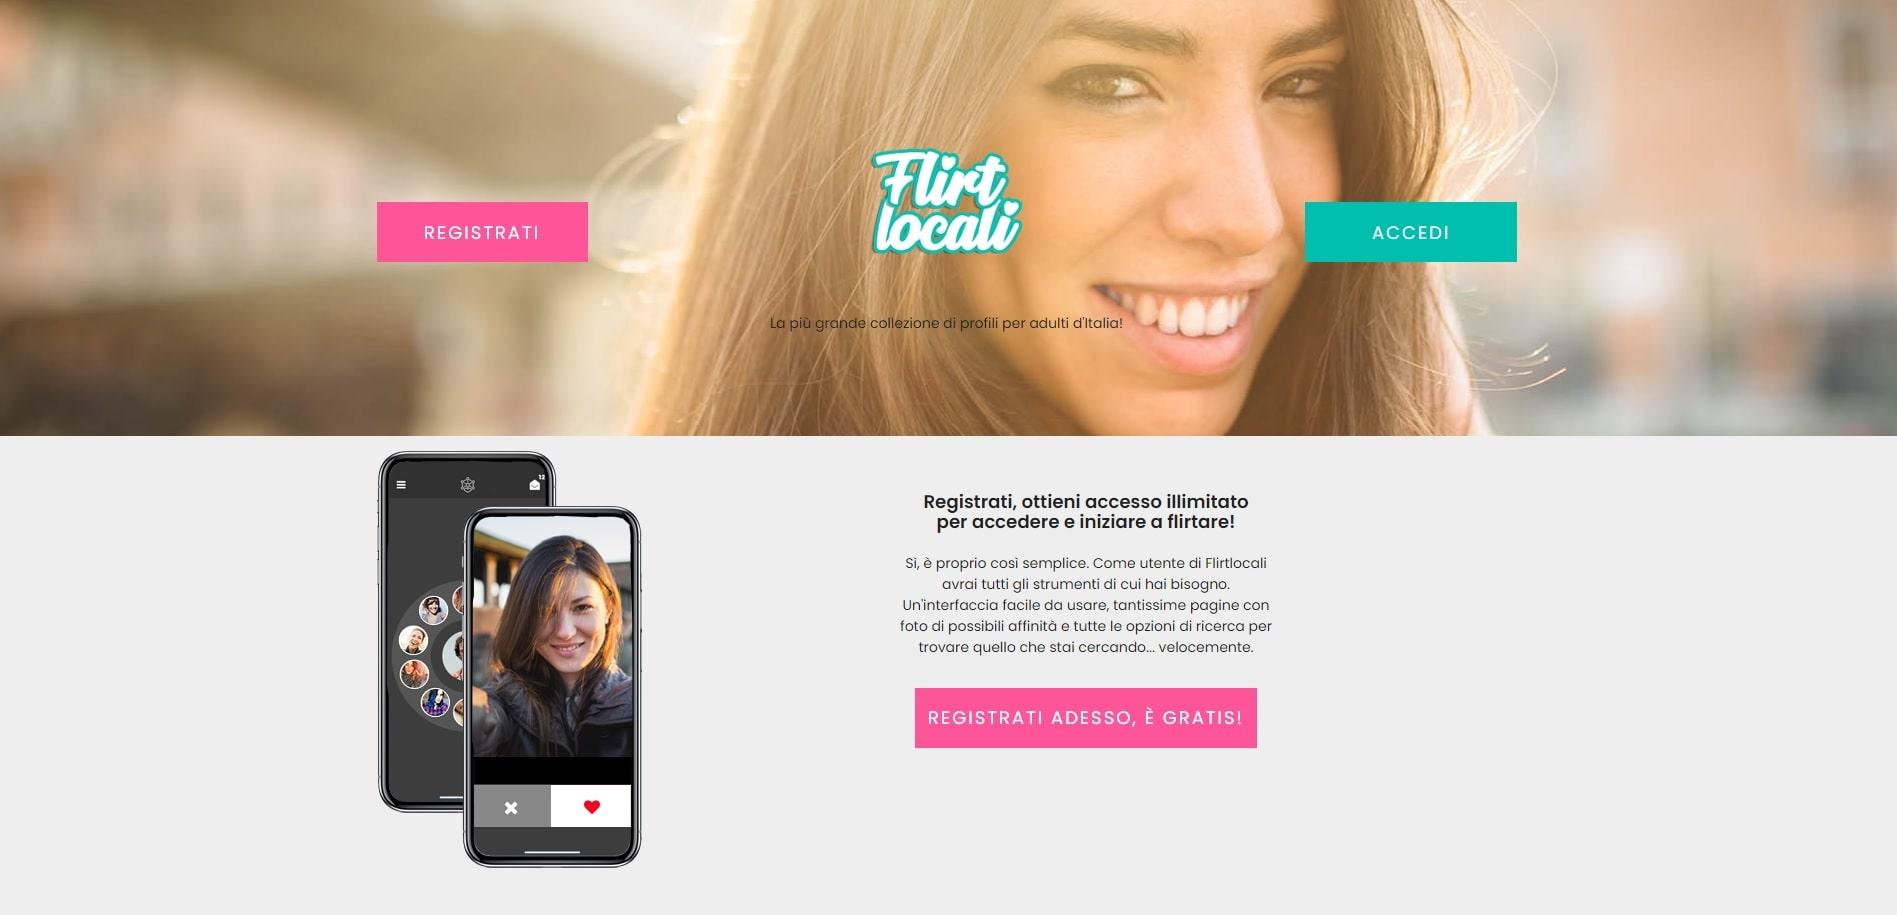 flirtlocali.com